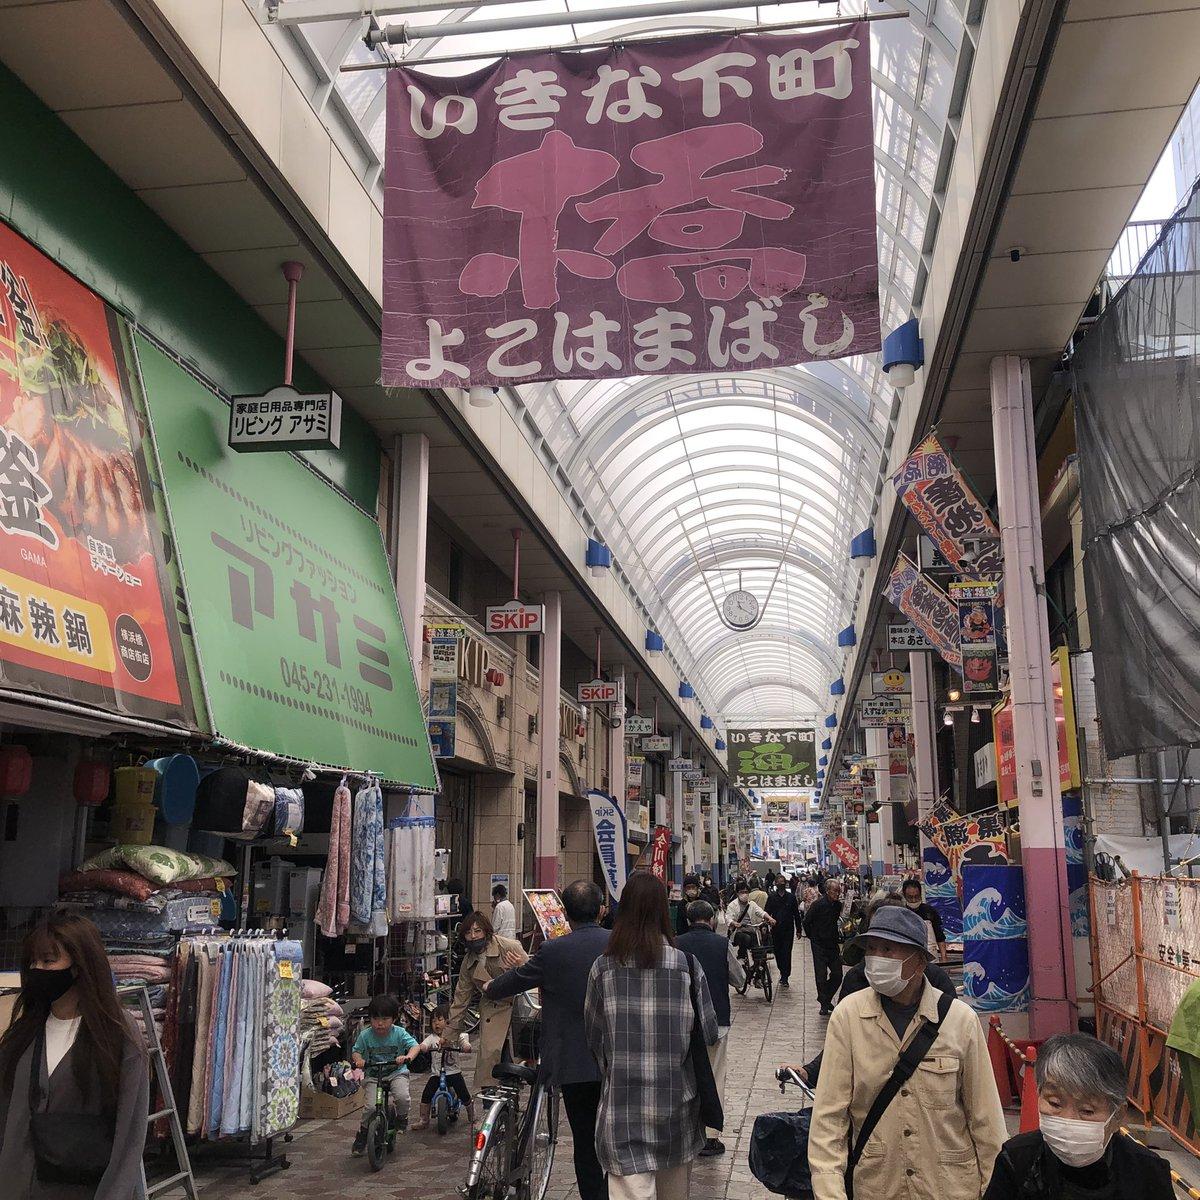 test ツイッターメディア - 「横浜橋商店街」は、我が日本国総理大臣であらせられる菅義偉の聖地。また、落語の大御所桂歌丸の生地でもあると言う、大変な商店街でありますな(^_^) お暇な方は遊びに来てね! #横浜橋商店街 #よこはまばし #菅義偉 #桂歌丸 #黄金町 #真金町 https://t.co/Kyw8Lq25aX